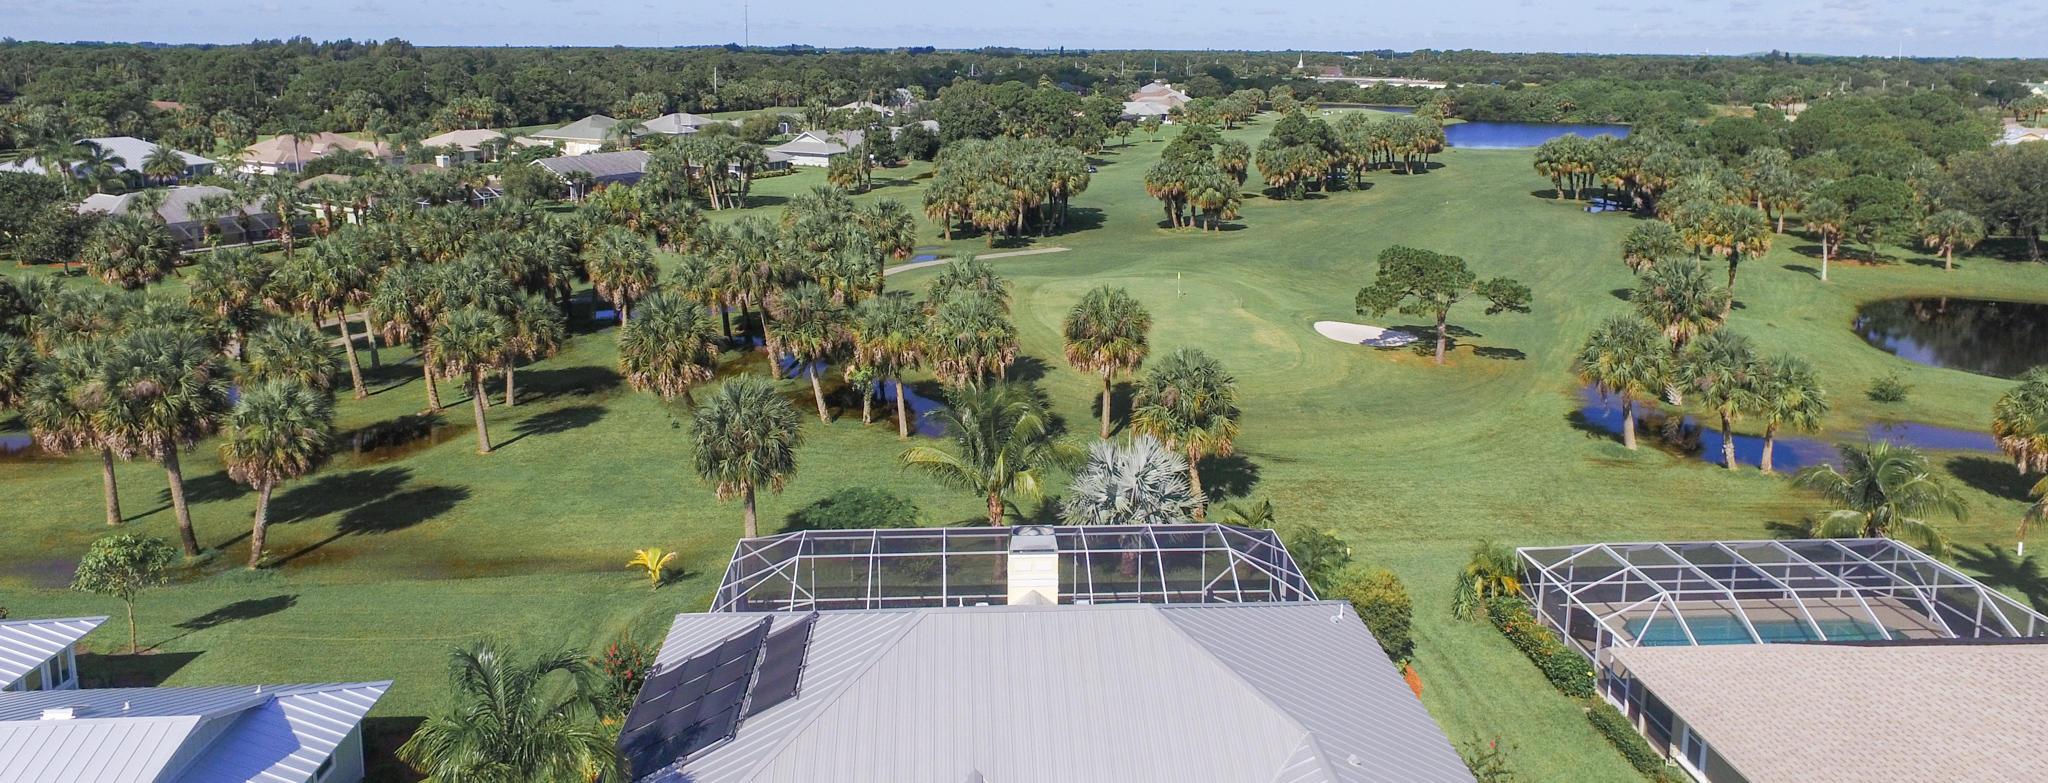 Aerial View surroundings